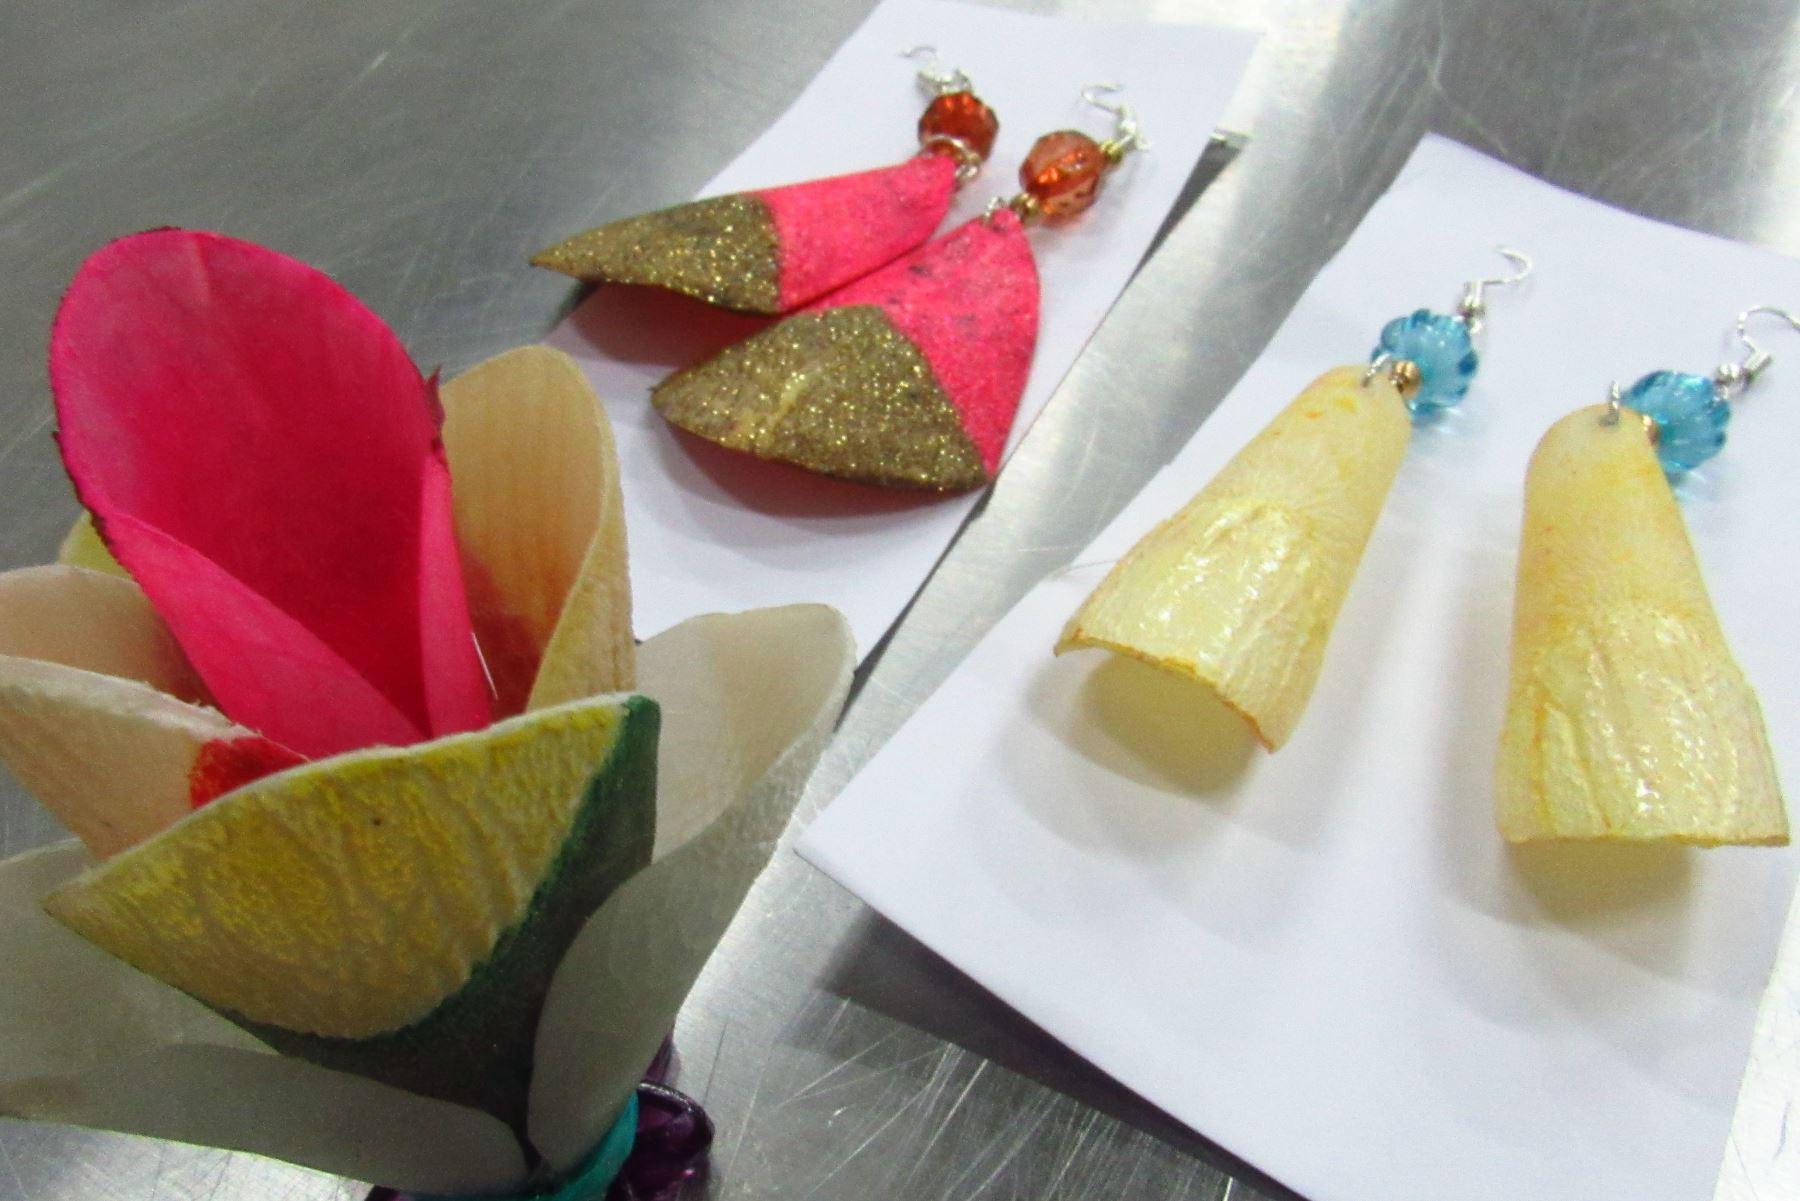 Emprendedores de Ucayali elaboran bisutería a base escama de paiche y otros productos derivados de residuos pesqueros. ANDINA/Difusión